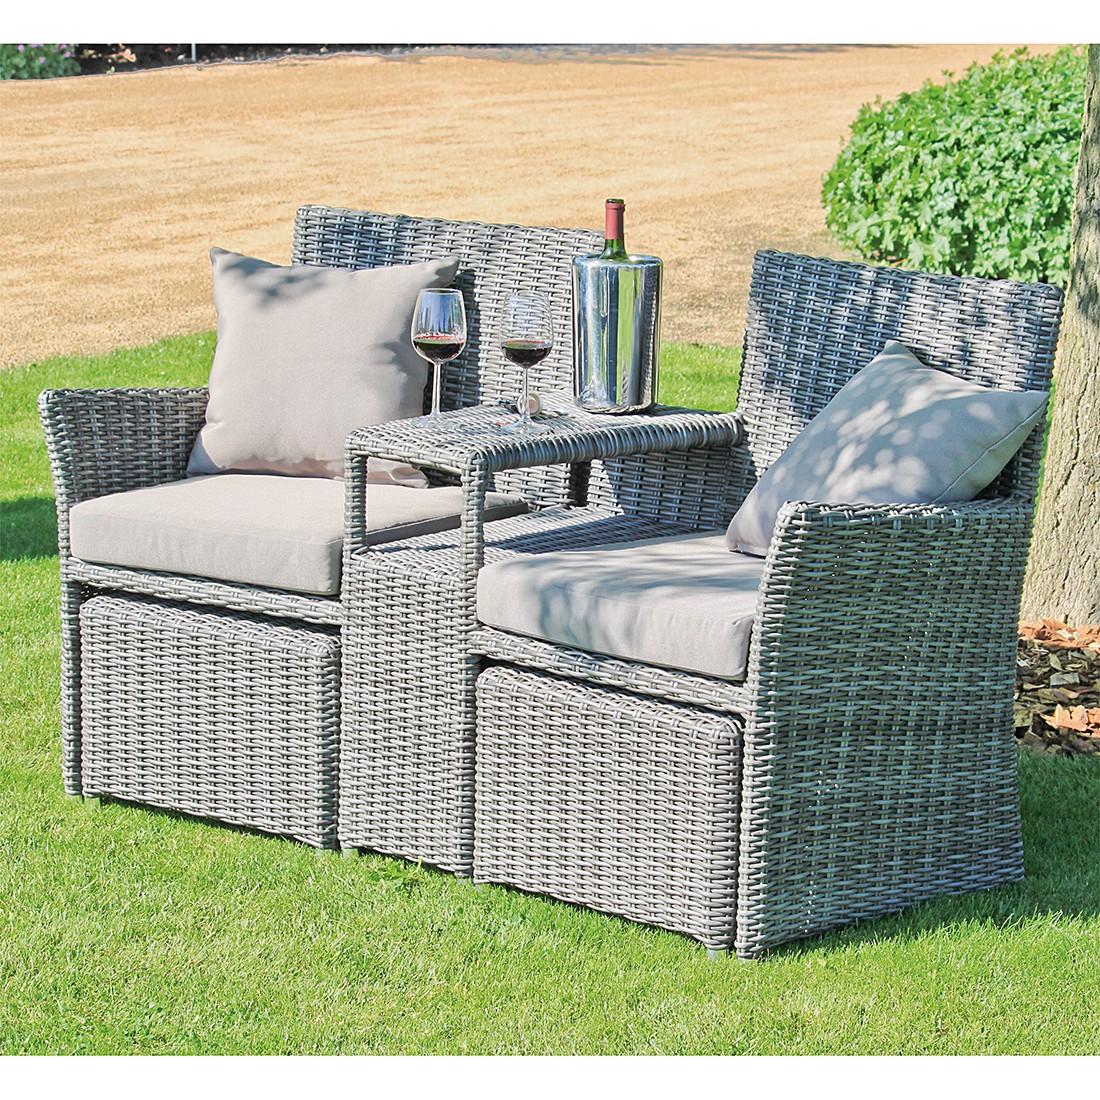 polyrattan stuhl grau beautiful polyrattan stuhl verona grau with polyrattan stuhl grau finest. Black Bedroom Furniture Sets. Home Design Ideas